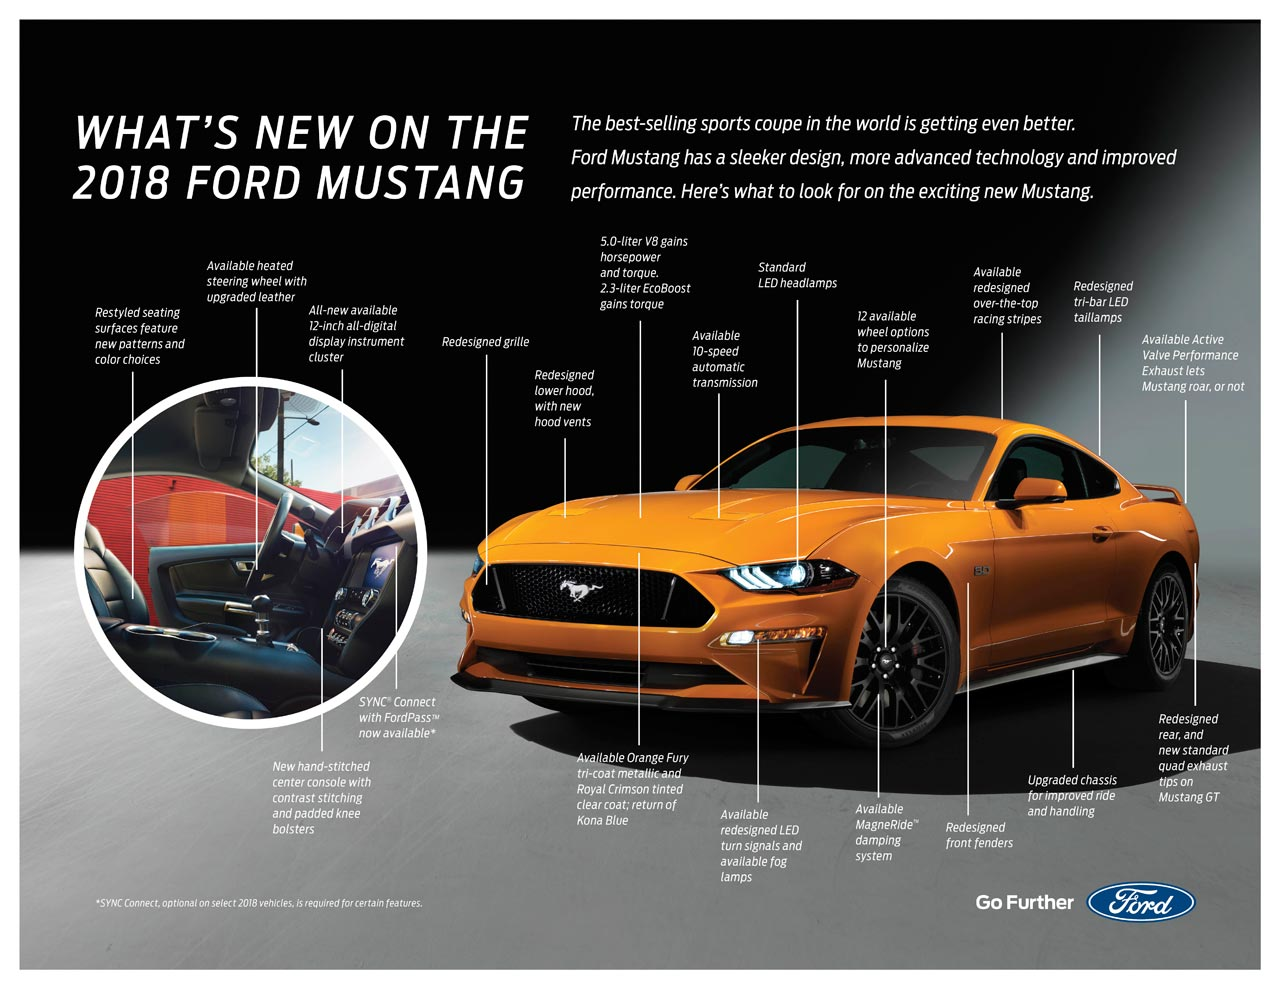 Cambios Nuevo Ford Mustang